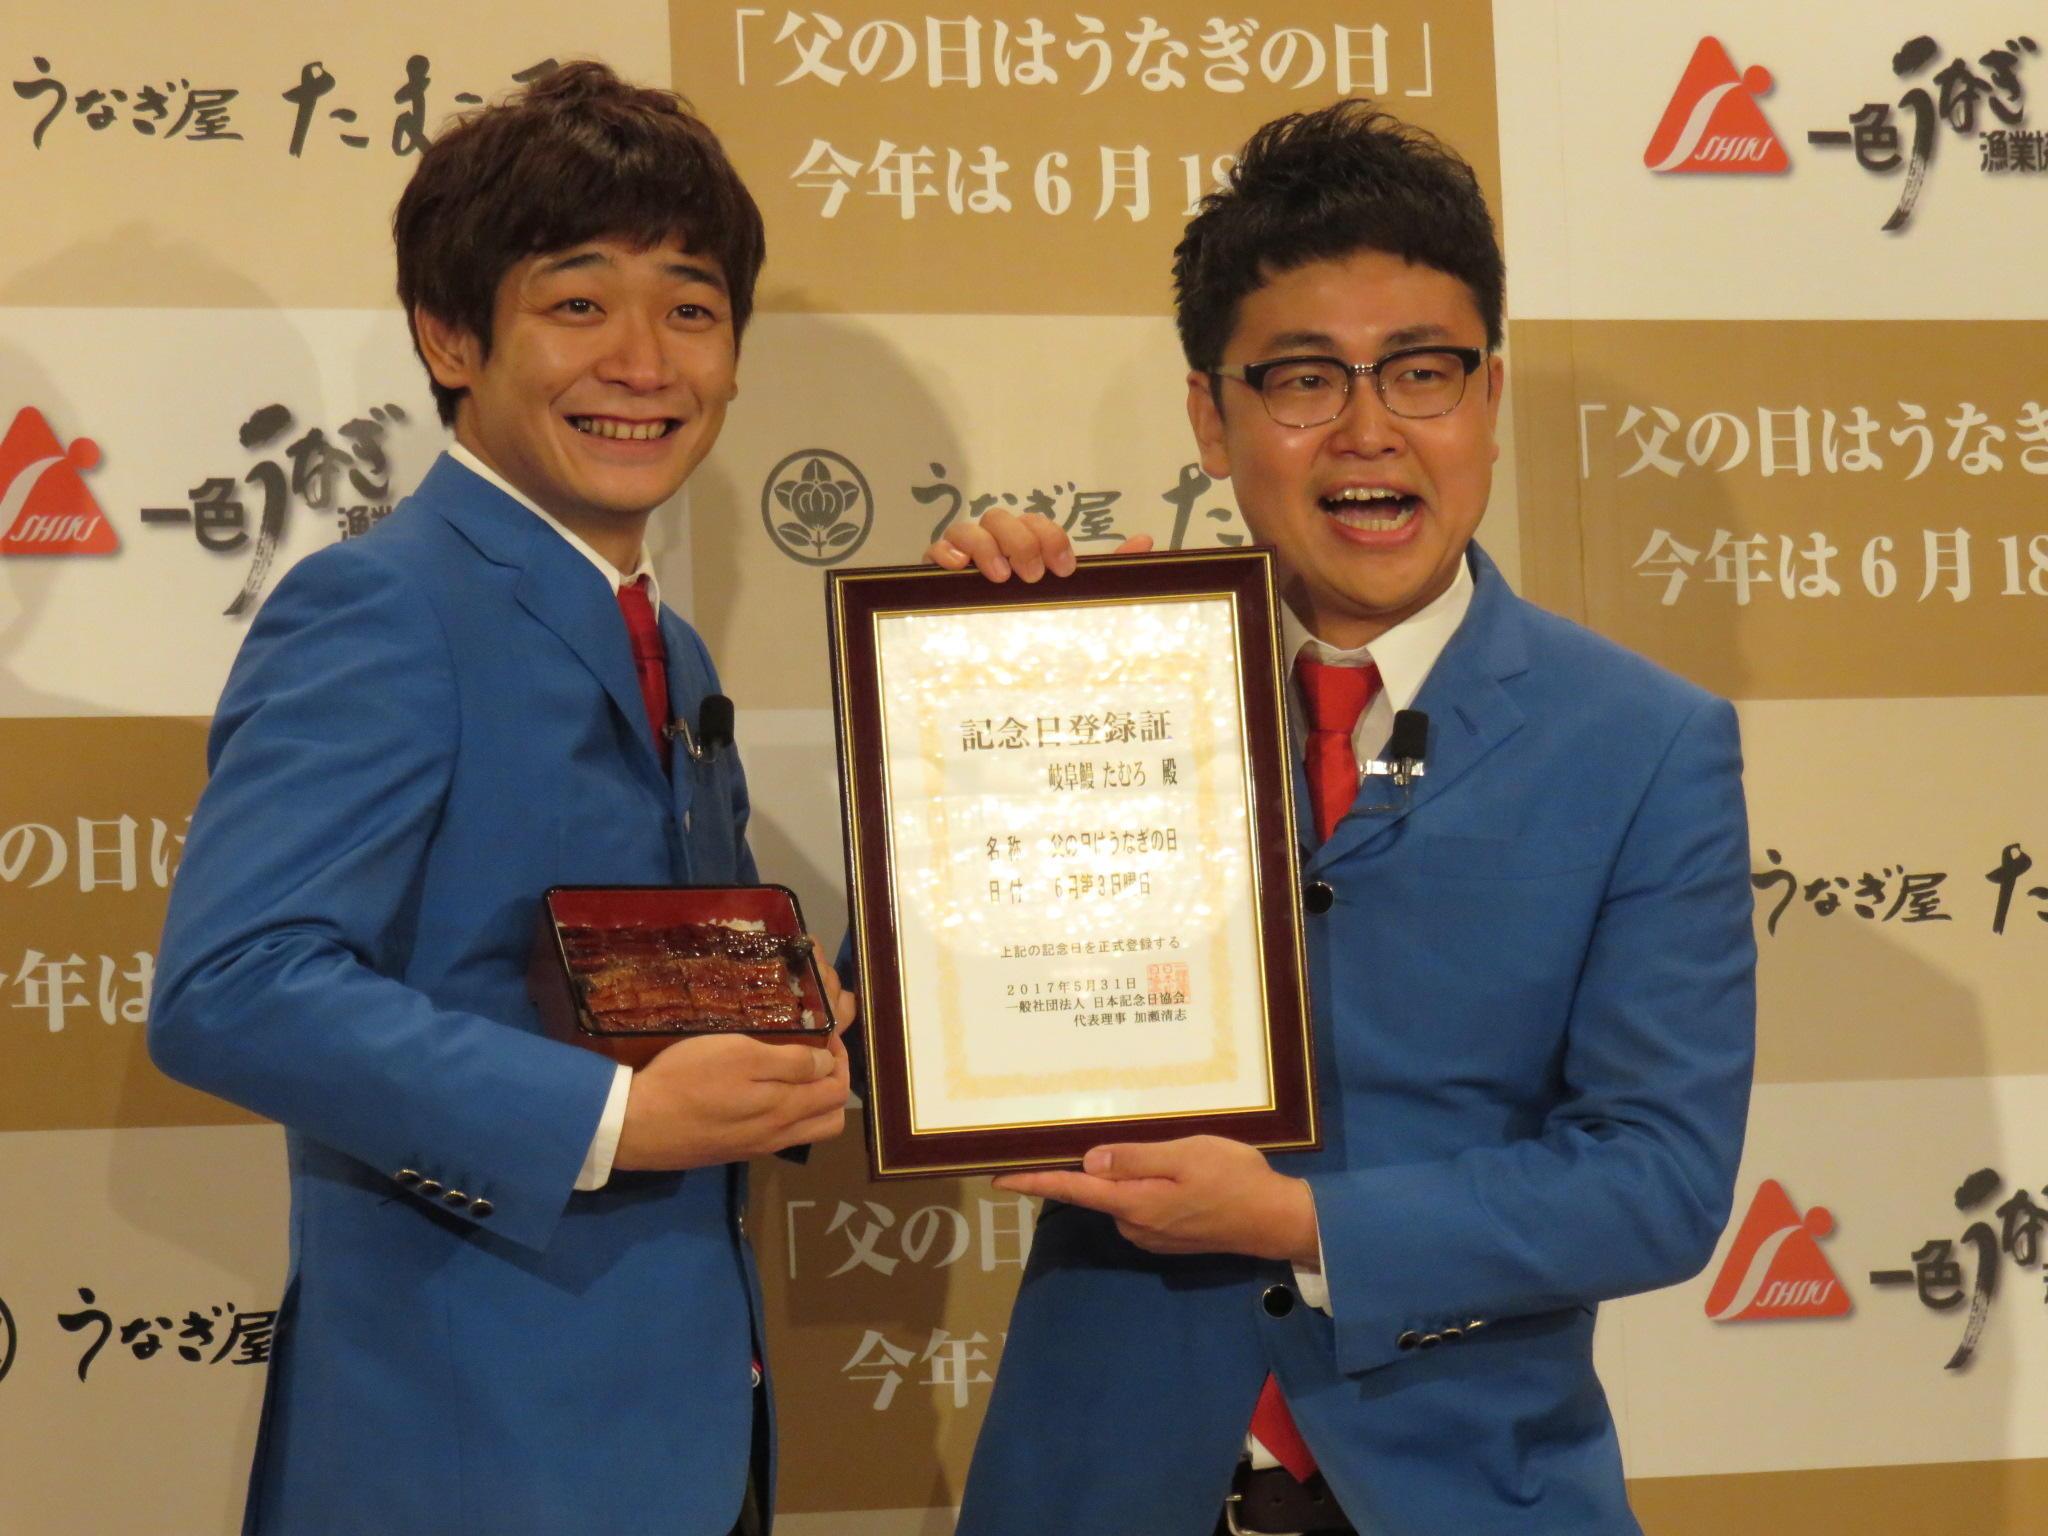 http://news.yoshimoto.co.jp/20170531163008-66e5575c4a0441ecc29f6eaaf06554e93a57d71c.jpg